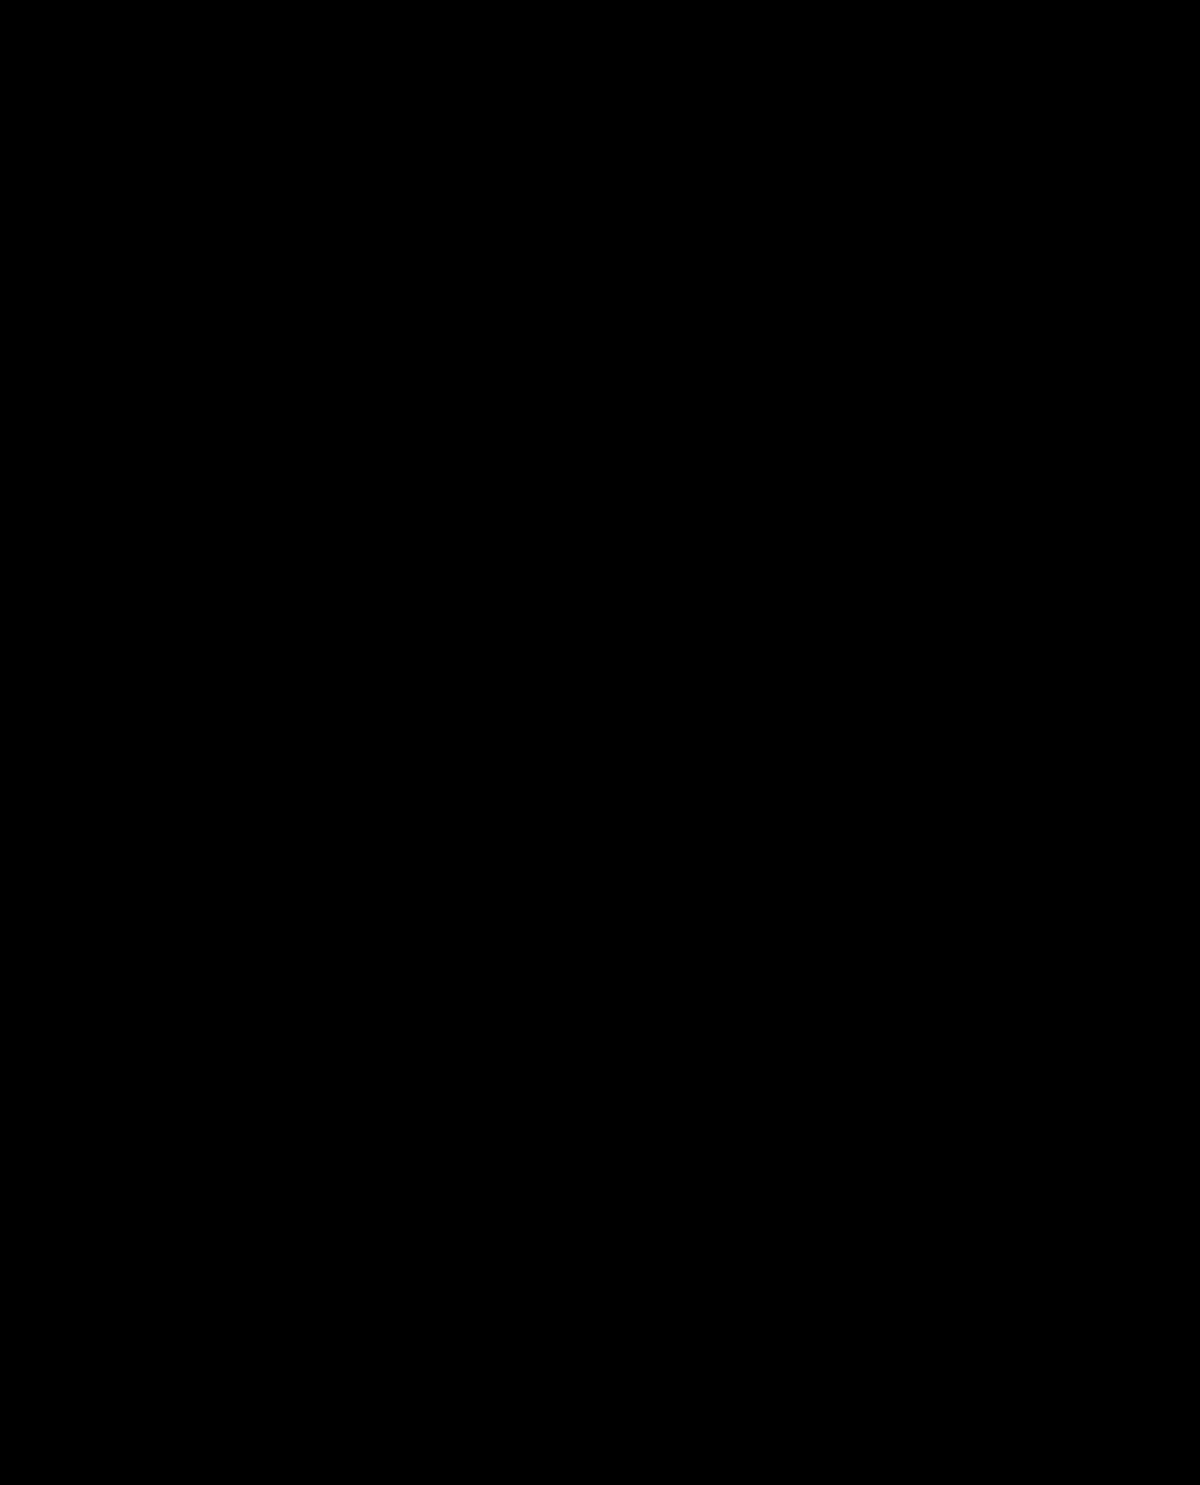 Exiplov